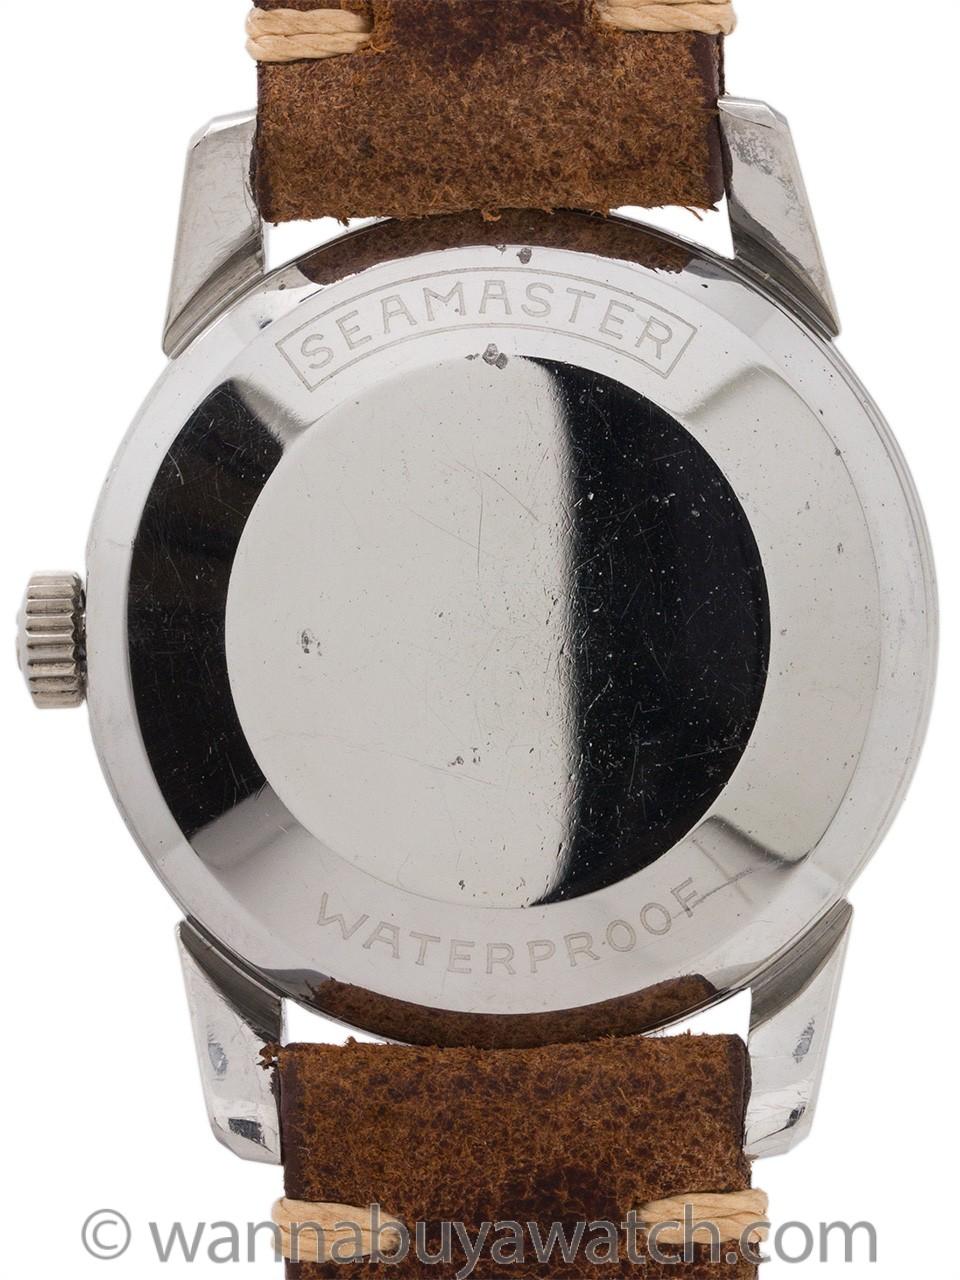 Omega Seamaster ref# 2848 circa 1956